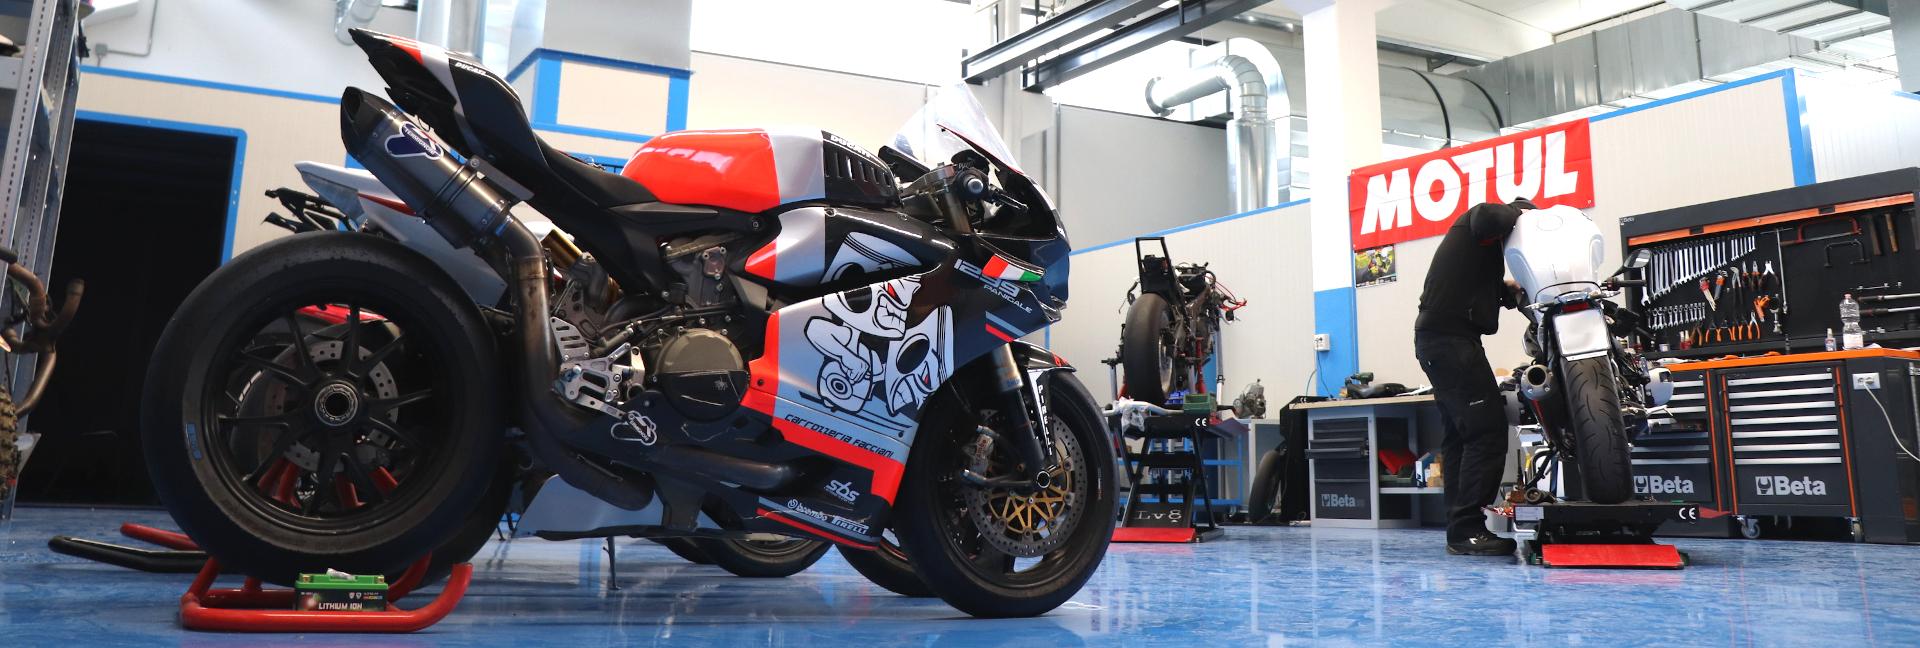 Officina Moto | Sale Prova | E-Shop | Racing